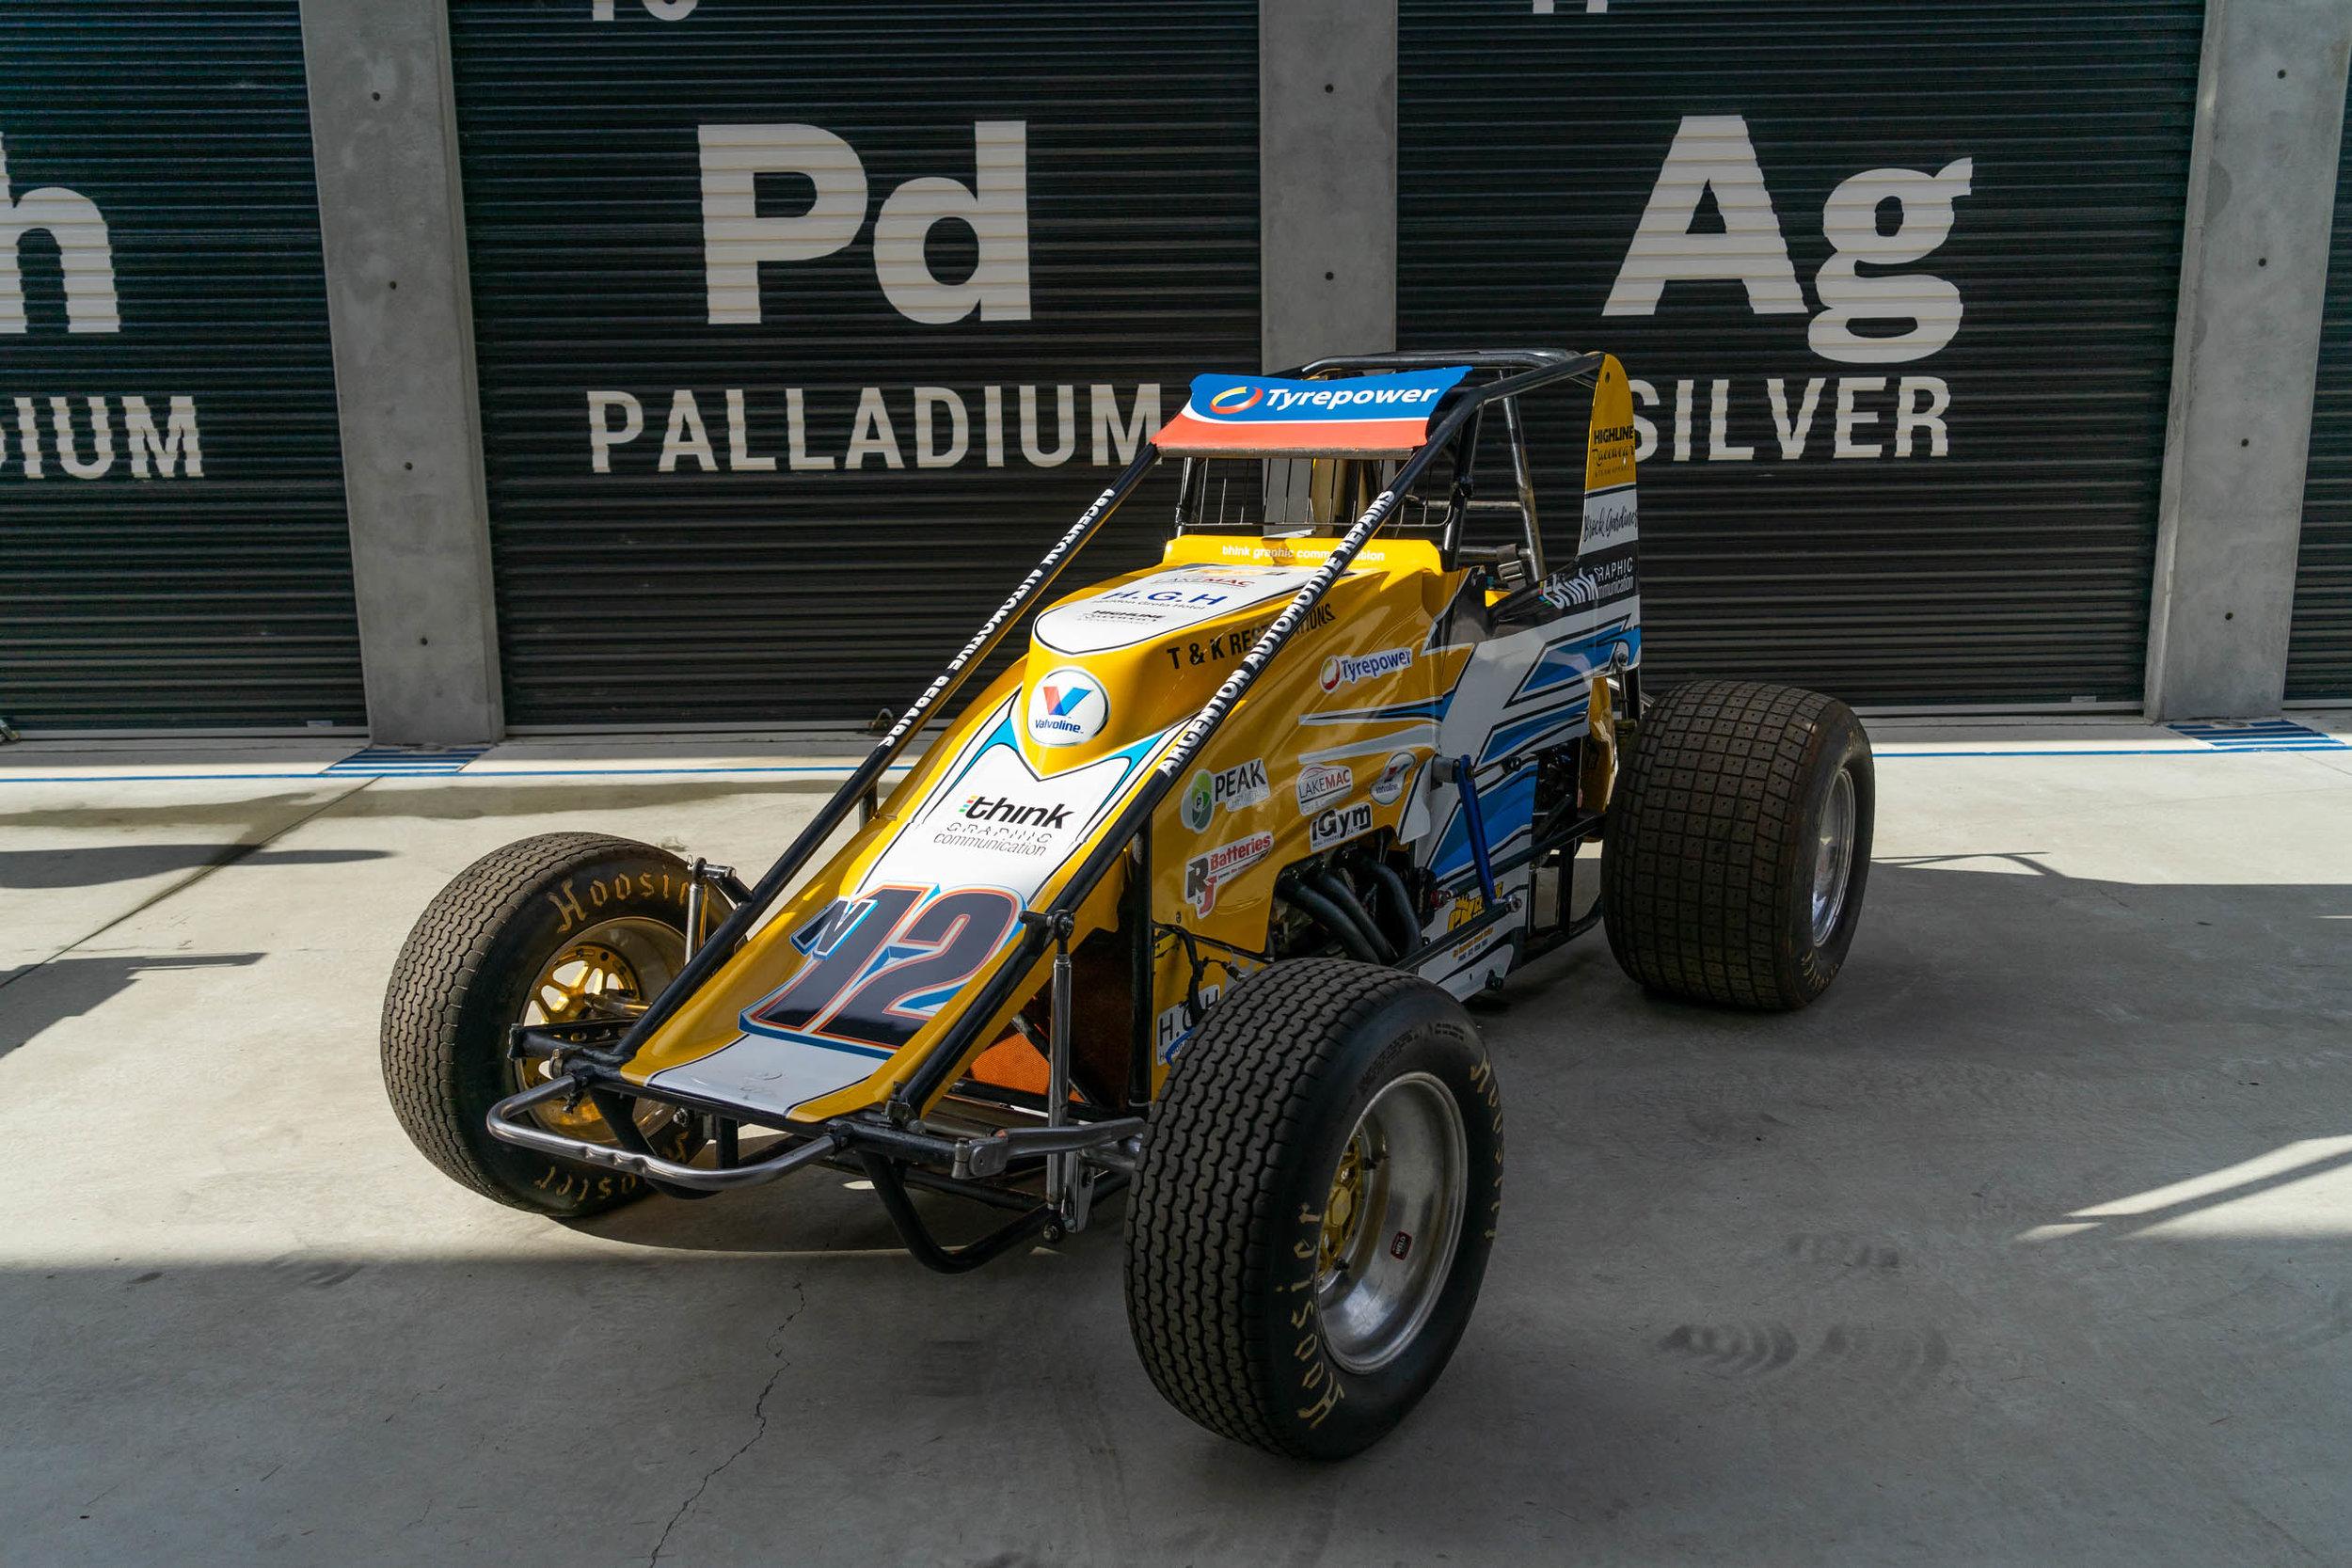 Gardiner motorsports racer think graphic wraps brock gardiner.jpg